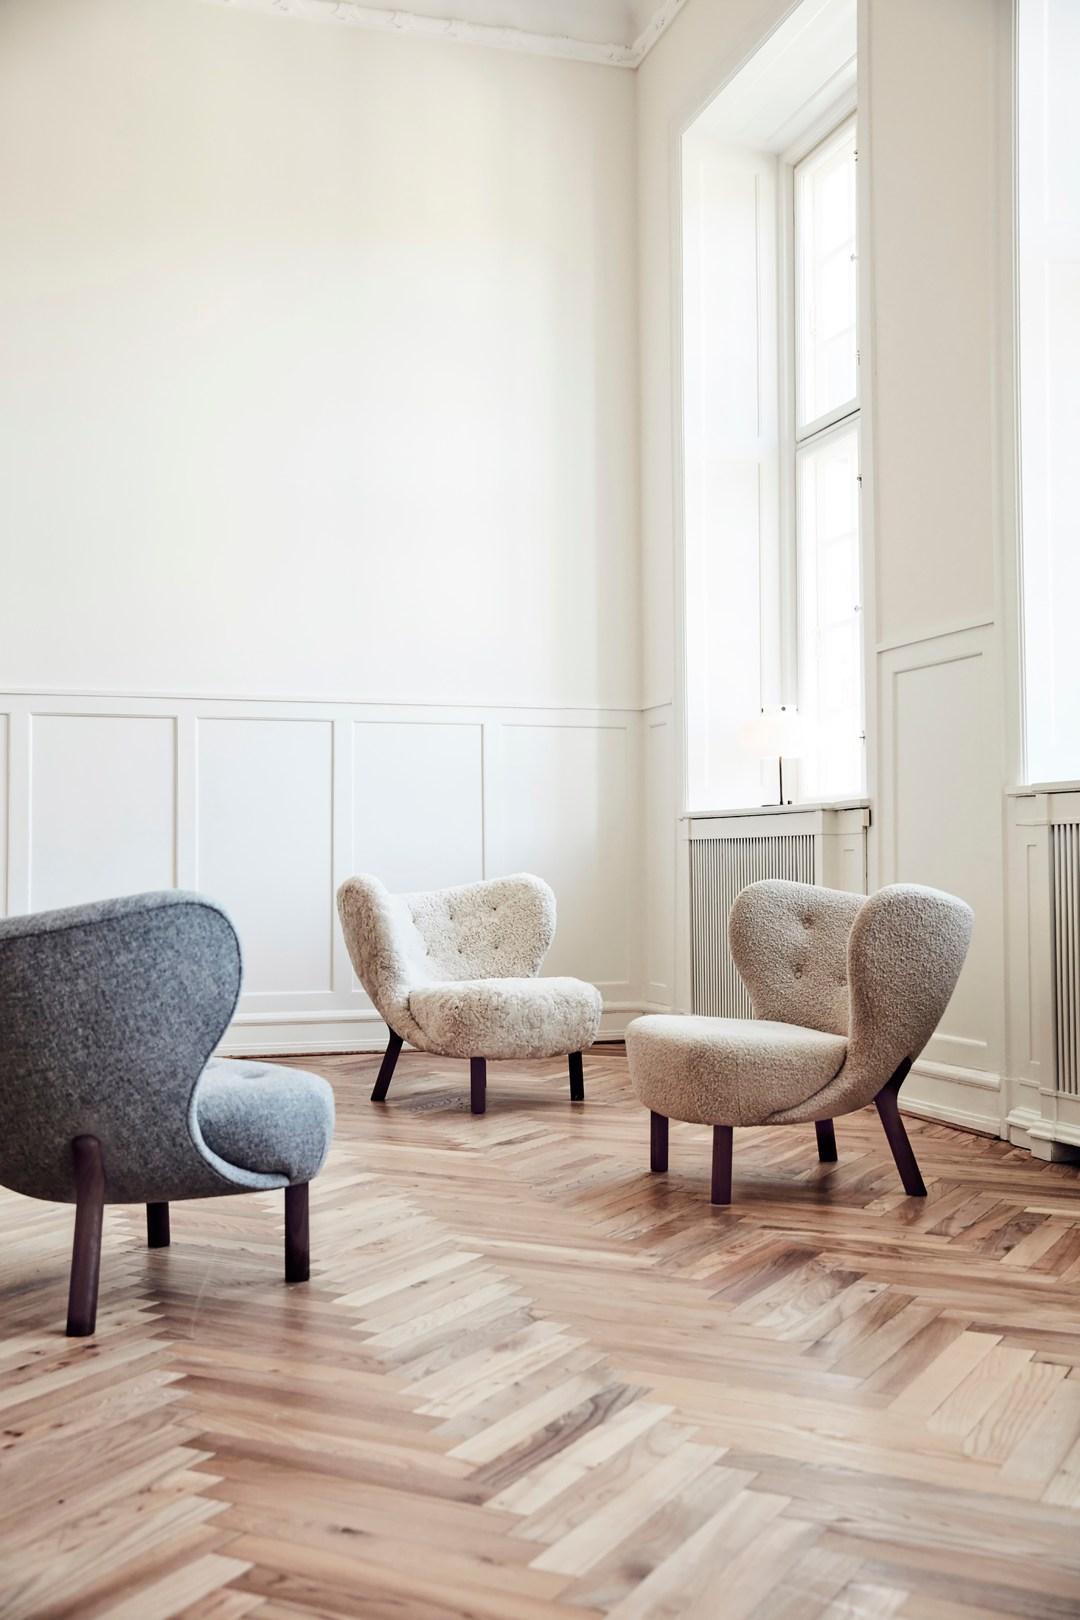 Design classics relaunched - Little Petra by Viggo Boesen 1938